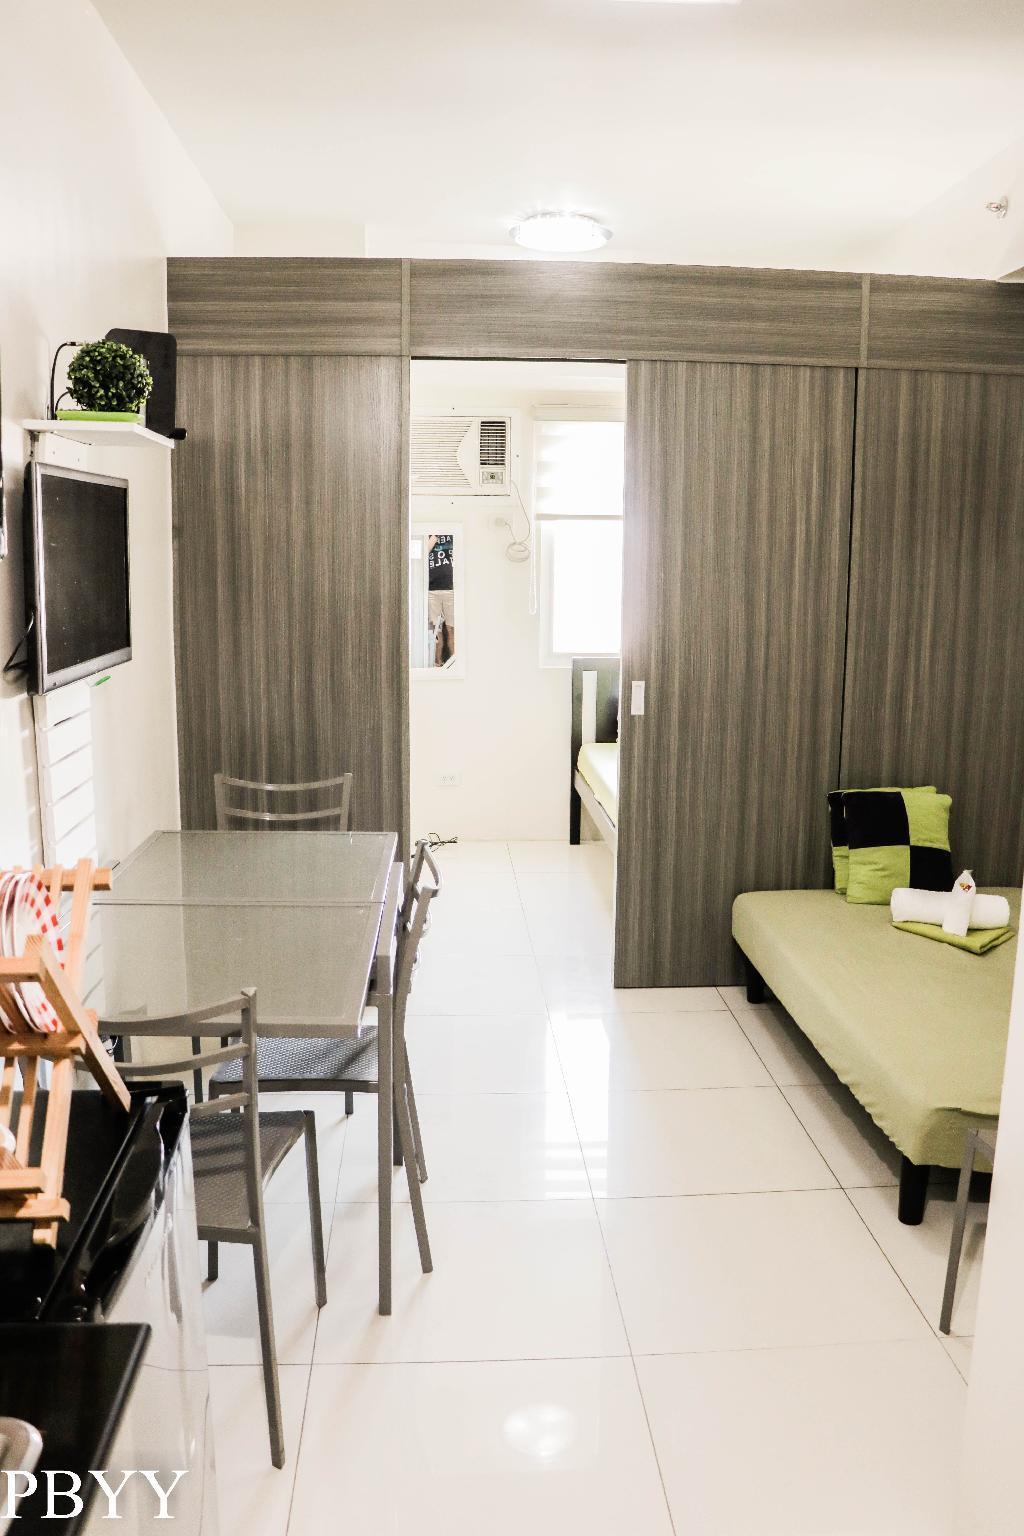 Green Residences Payless 1 Bedroom in Metro Manila